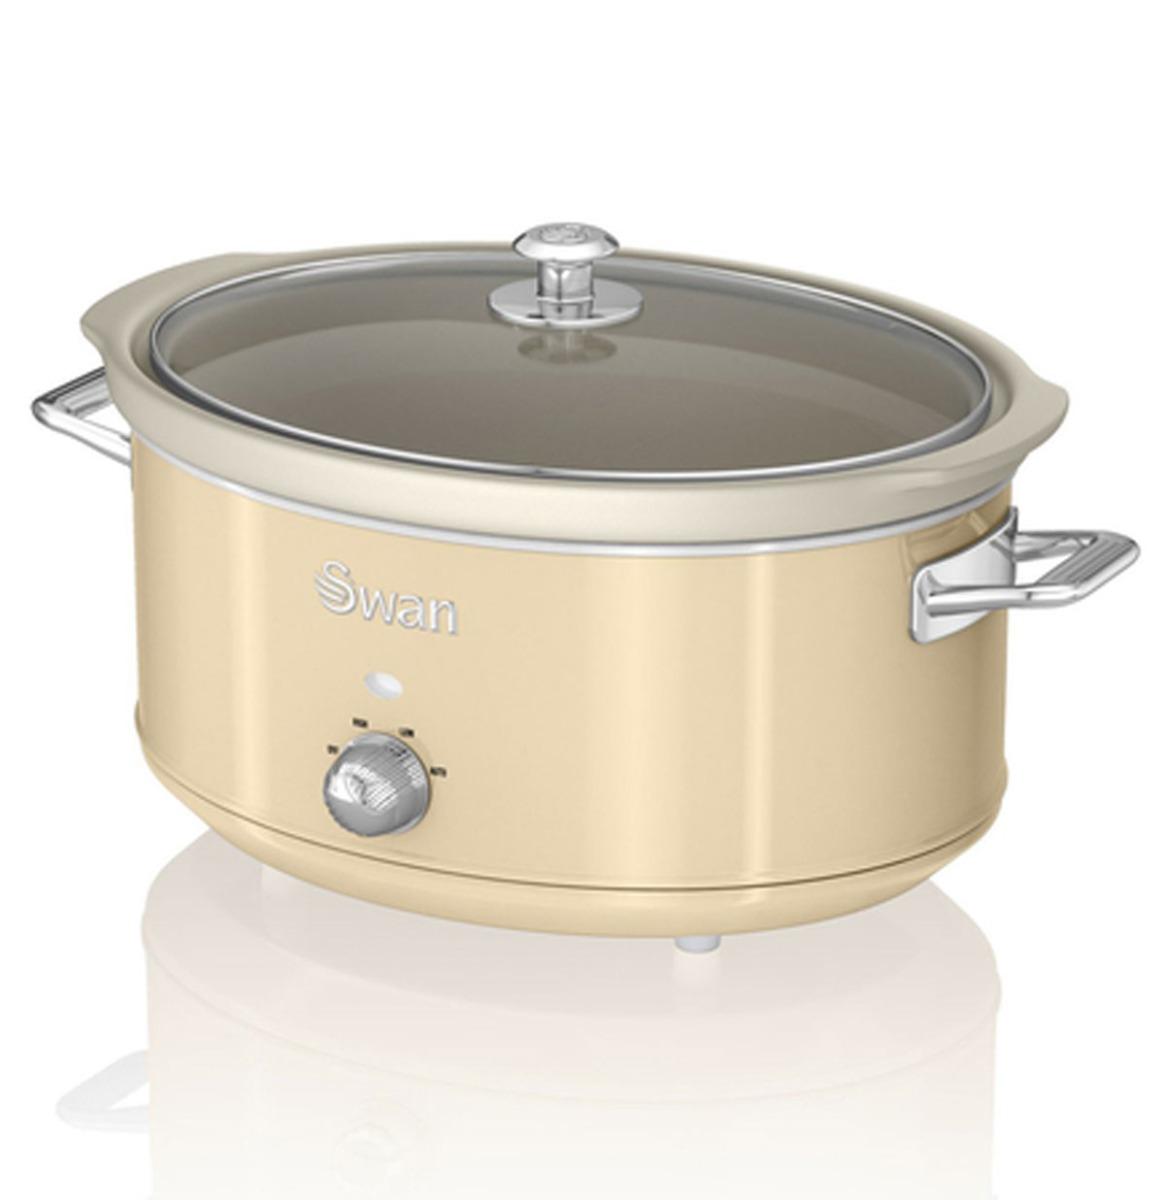 Swan Retro Slow Cooker - 6.5 Liter - Crème